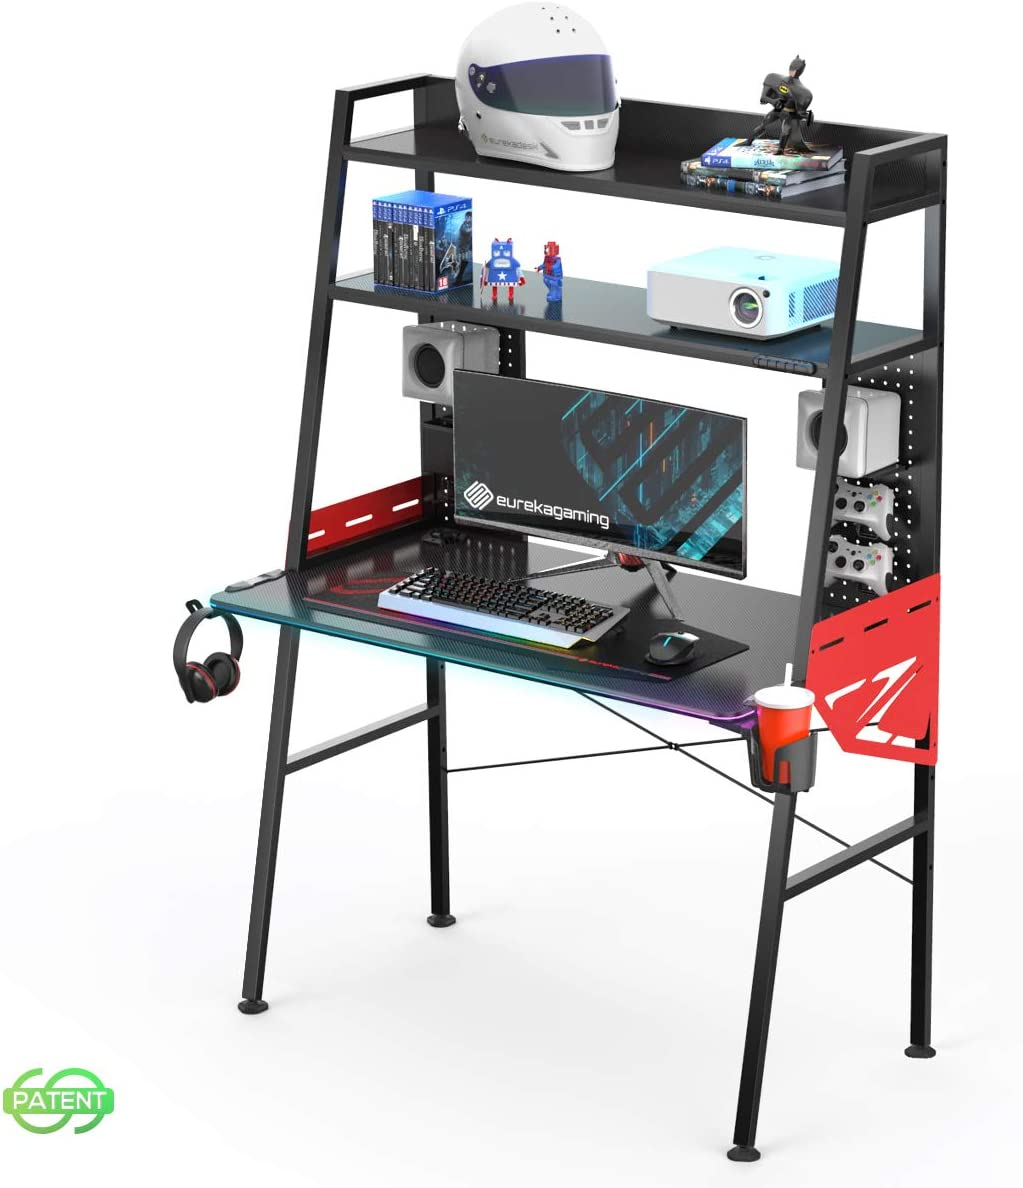 EUREKA ERGONOMIC wholesale 43 Inch Free Shipping New Black RGB Gaming LED Home Desk Ladder